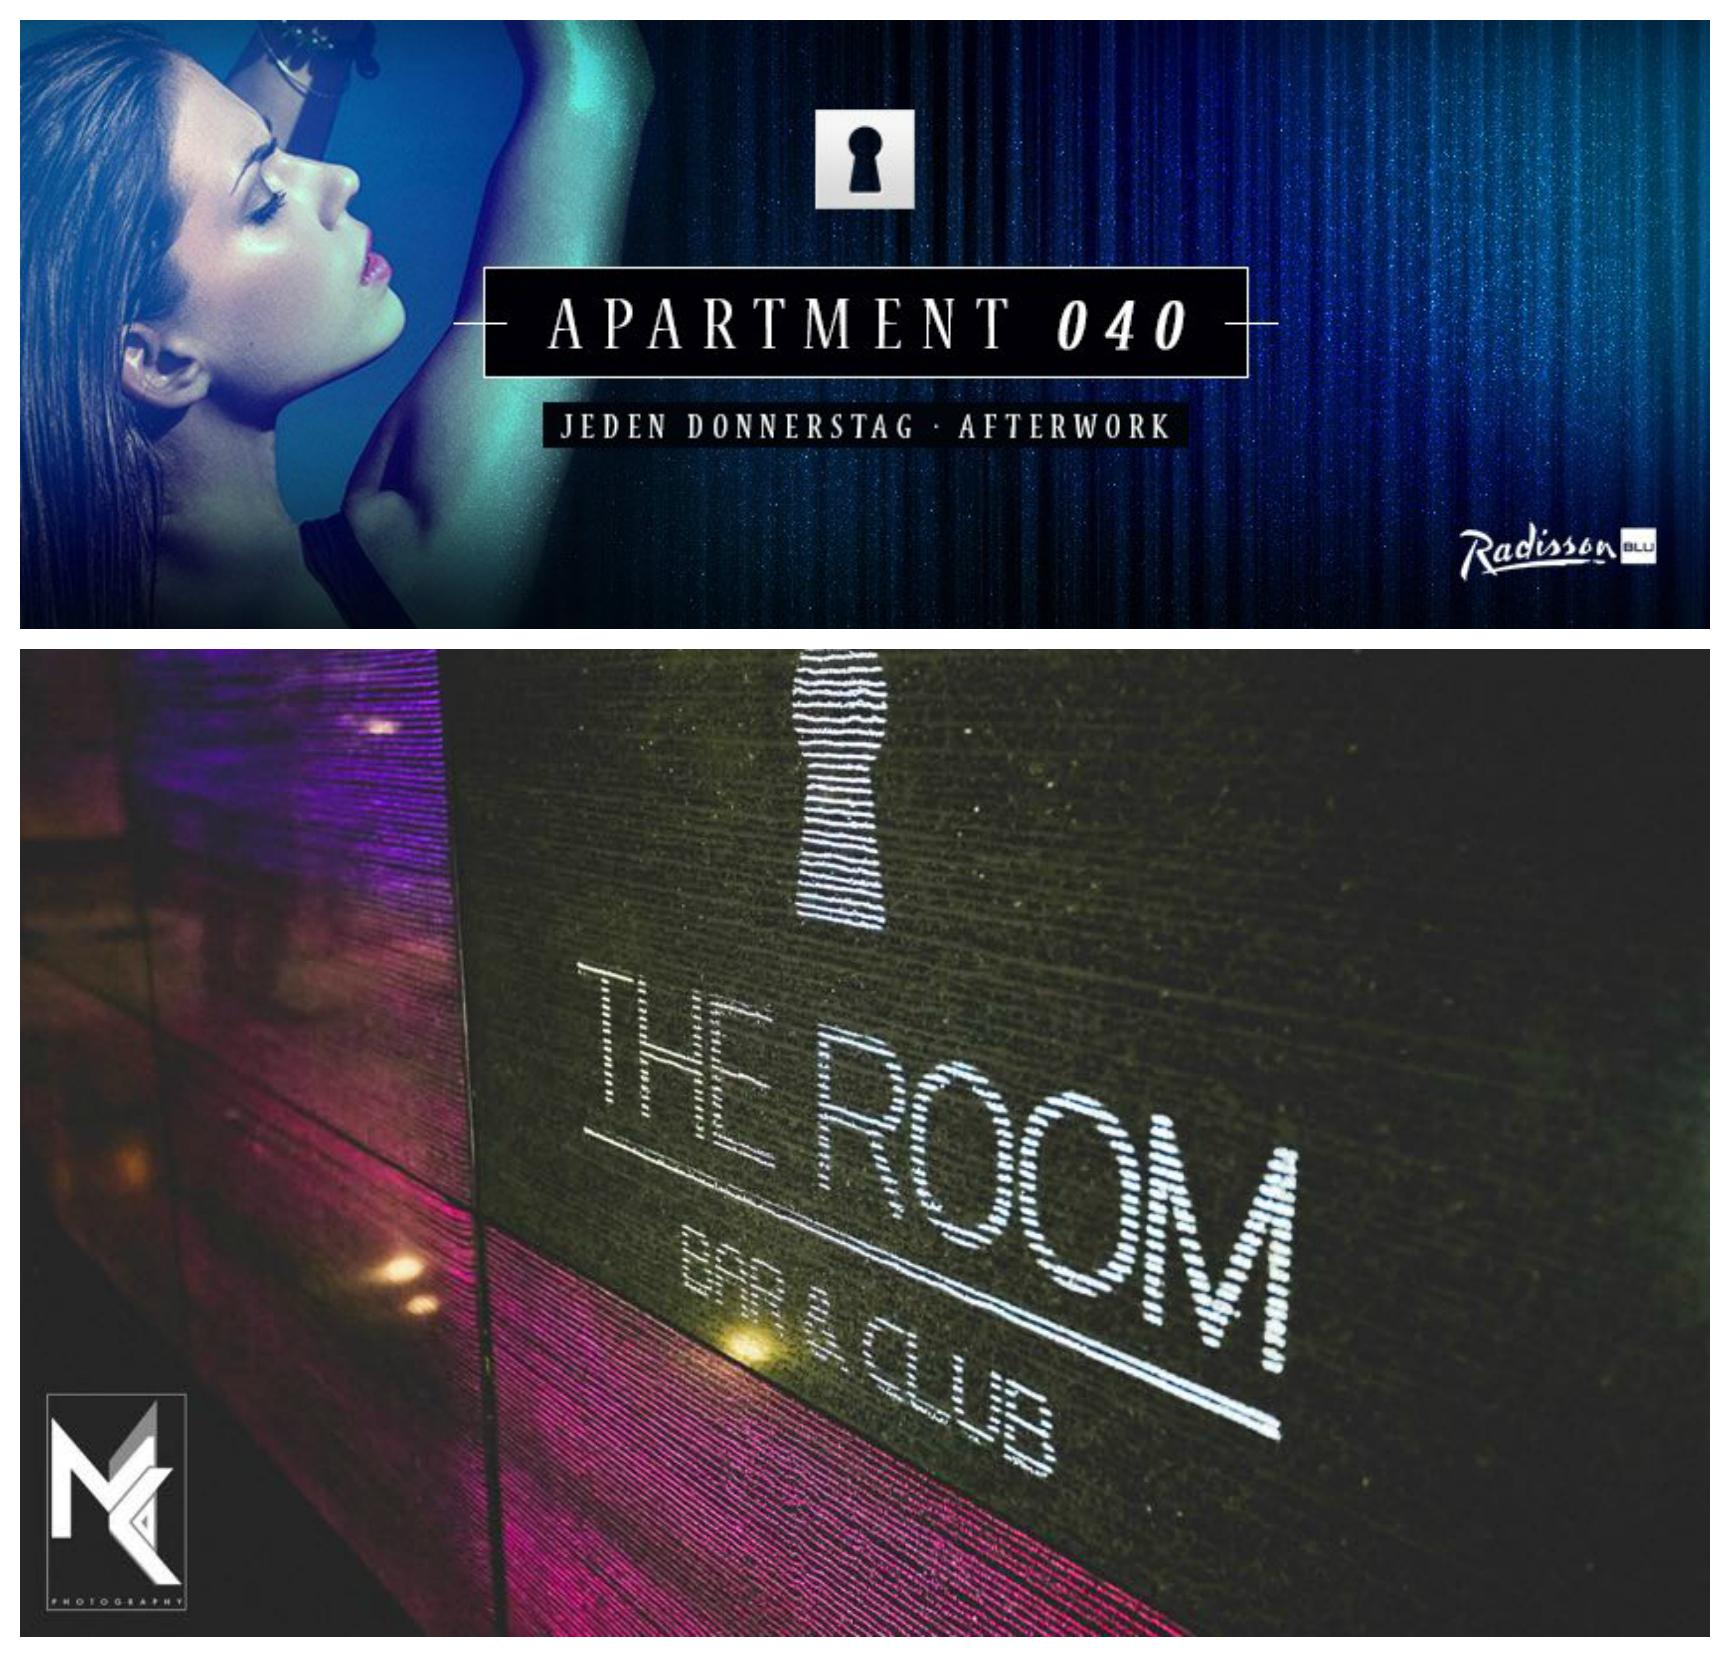 donnerstag 23 oktober after work action apartment 040 the room im radisson blue in. Black Bedroom Furniture Sets. Home Design Ideas